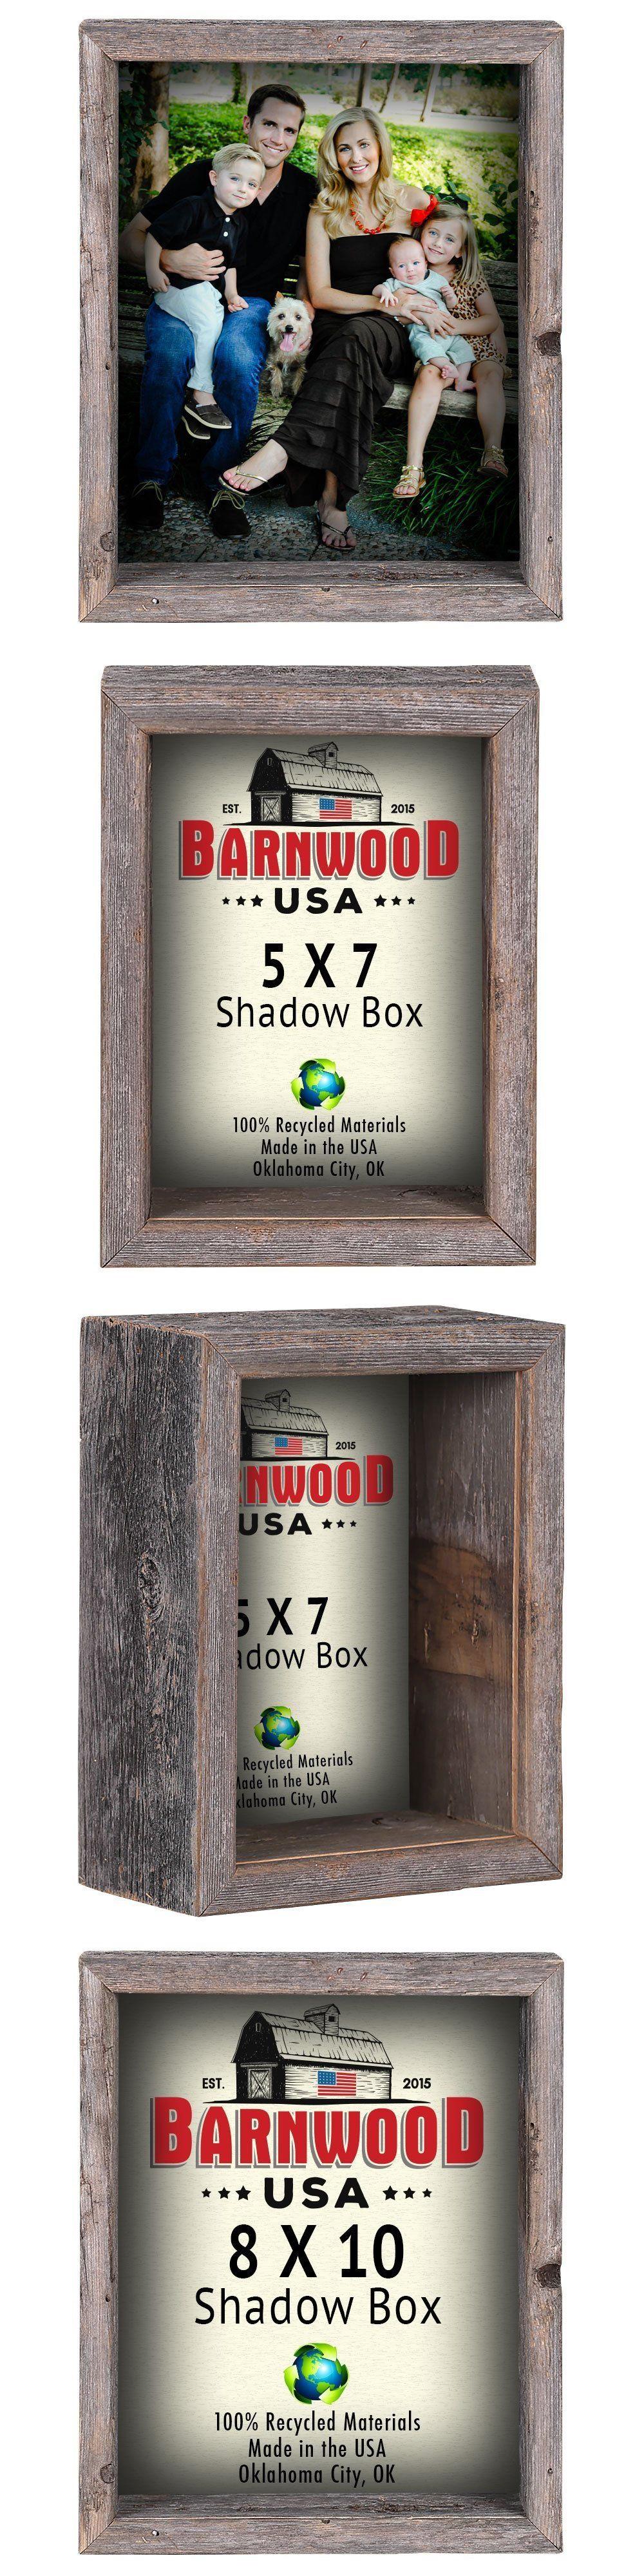 Double pistol handgun revolver gun display case cabinet rack shadowbox - Shadow Boxes 41512 Barnwoodusa Shadow Box Frame 100 Reclaimed Weathered Wood